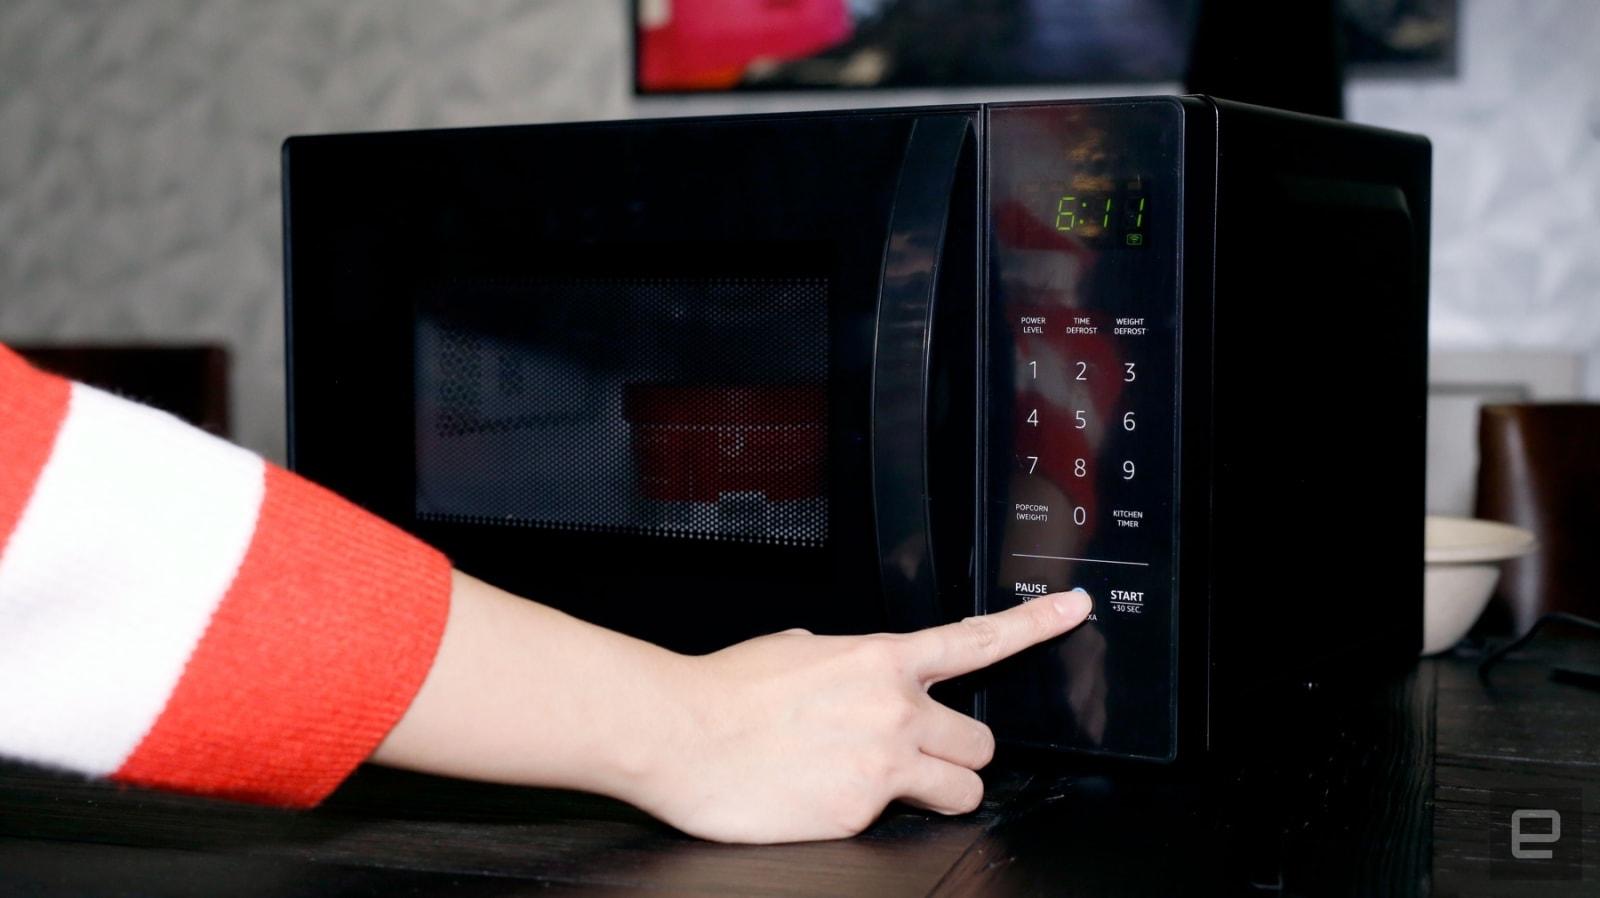 Amazon AmazonBasics Microwave